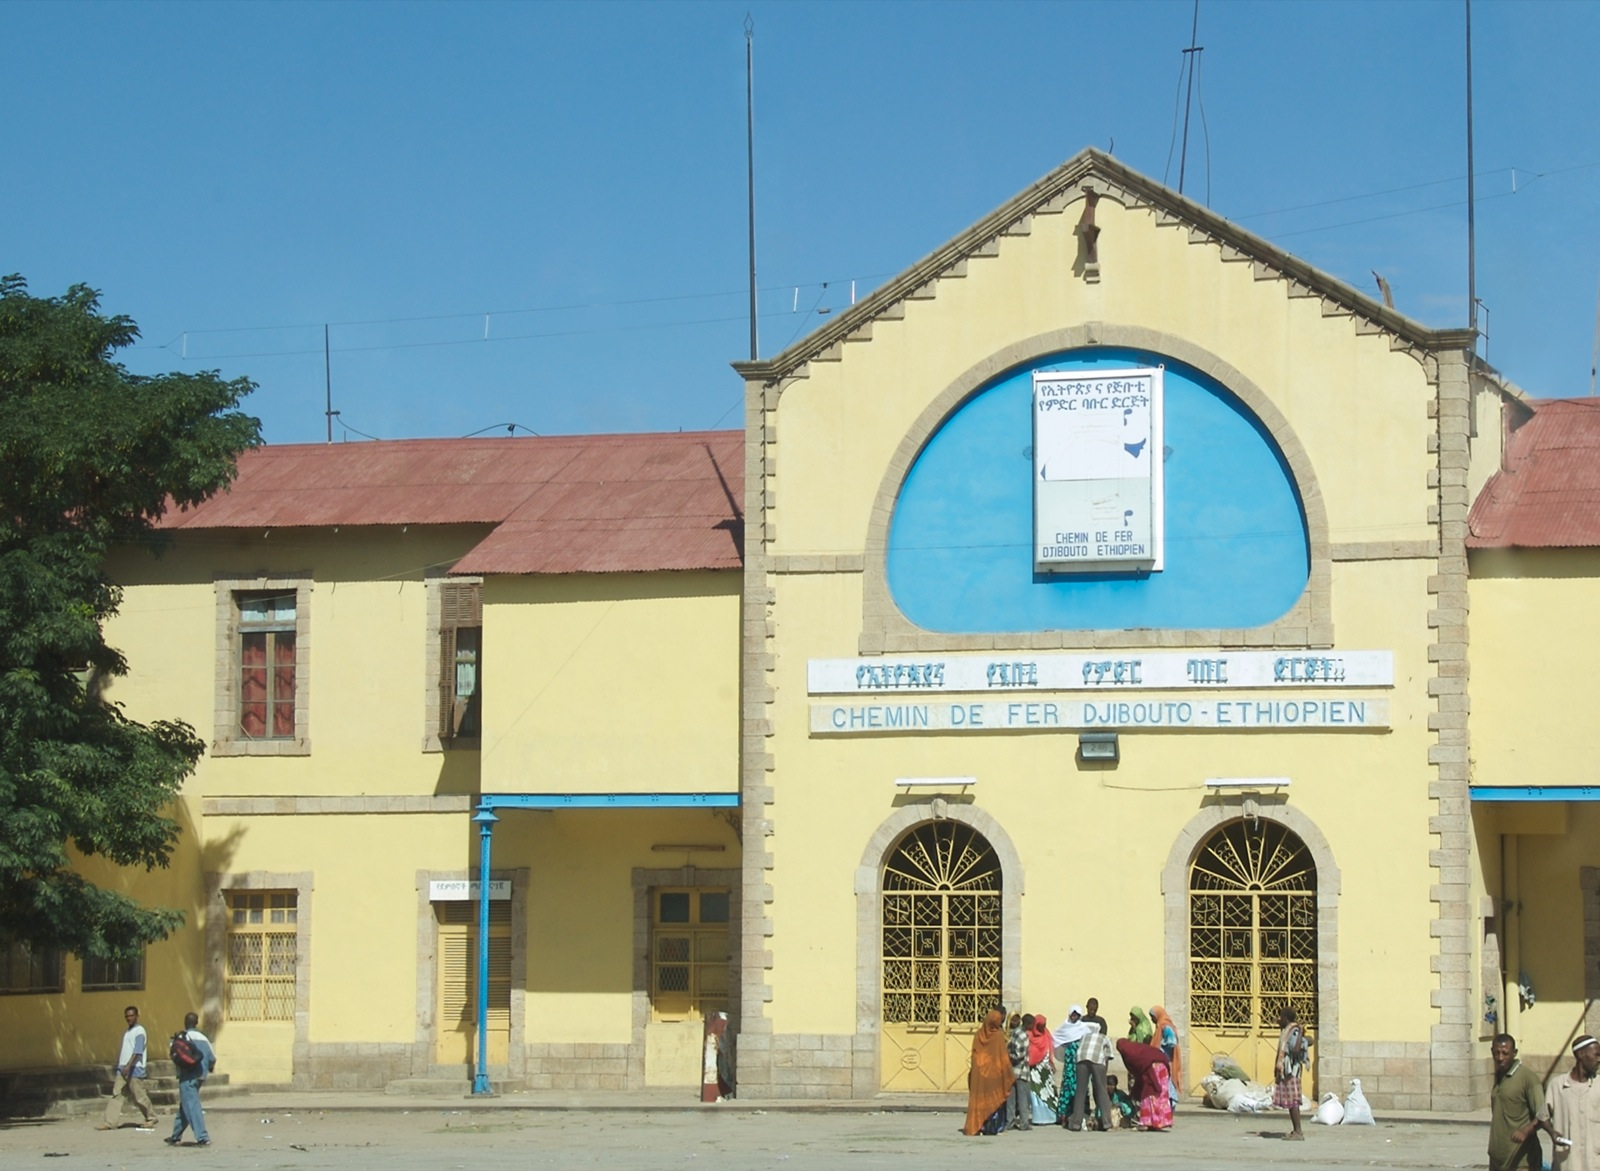 File:Djibouti - Ethiopia Railway Station, Dire Dawa, Ethiopia jpg